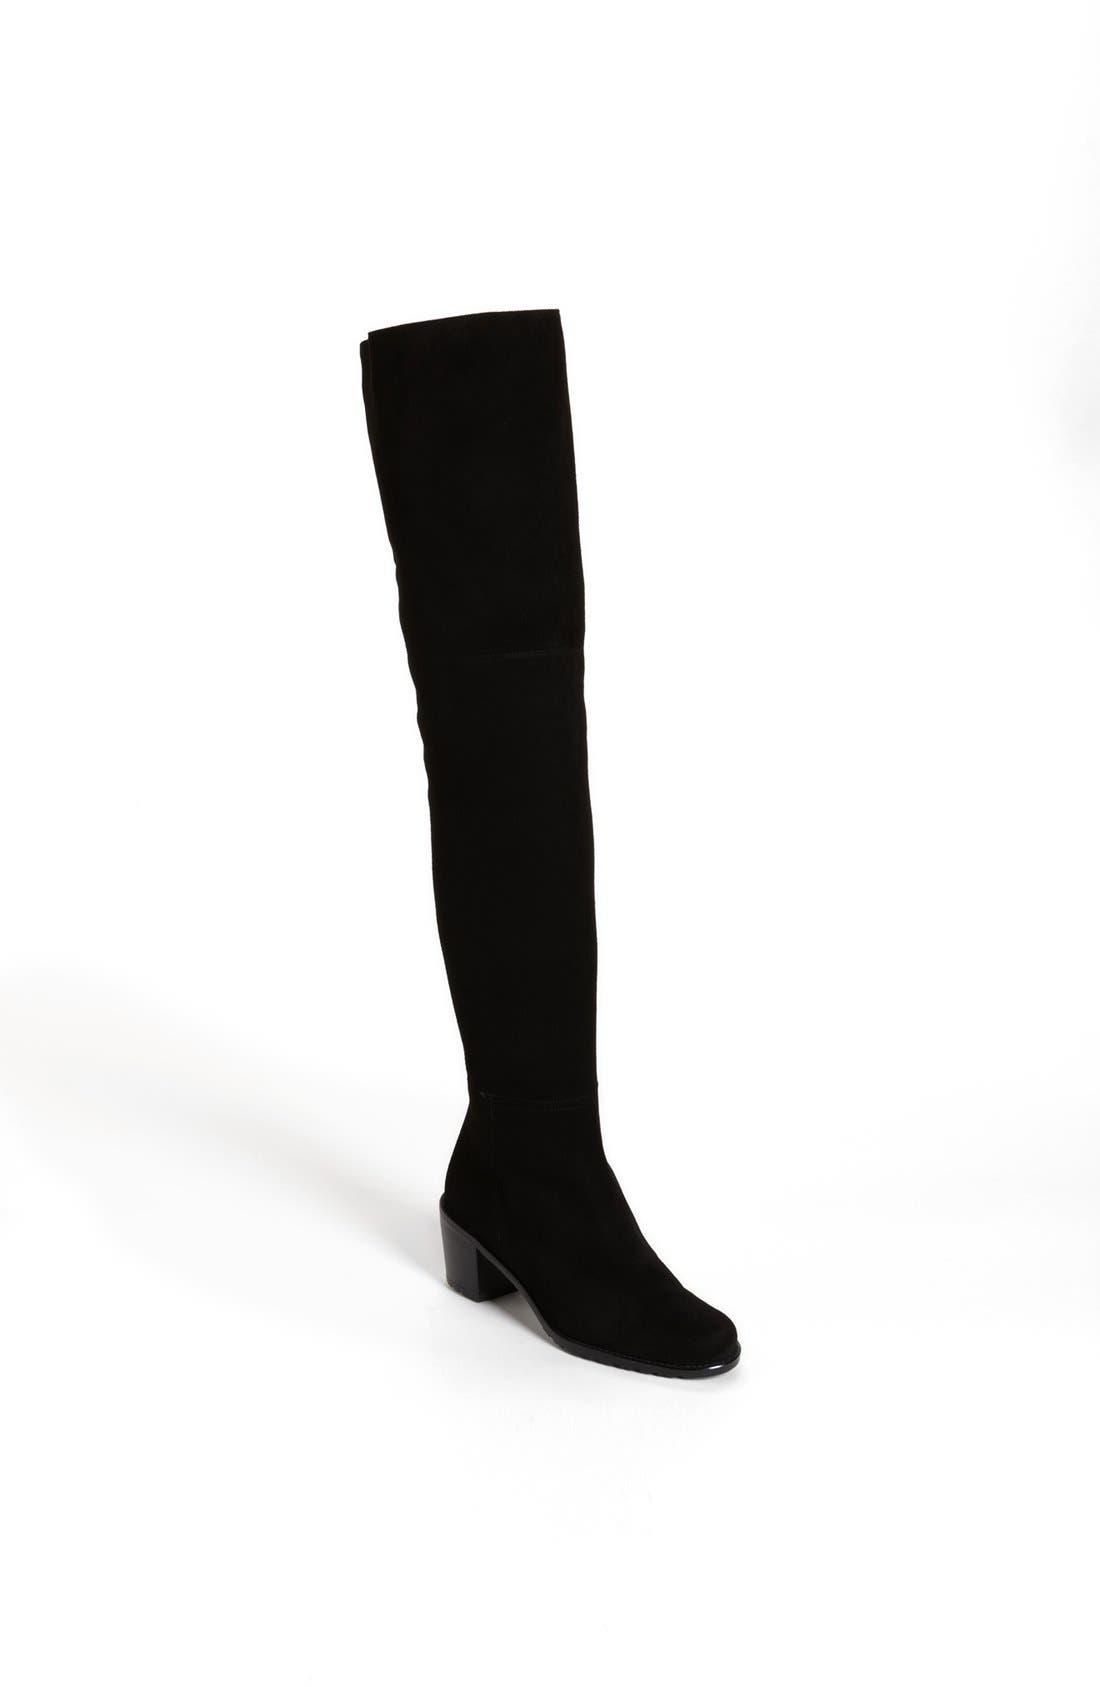 Alternate Image 1 Selected - Stuart Weitzman 'Hitest' Over the Knee Boot